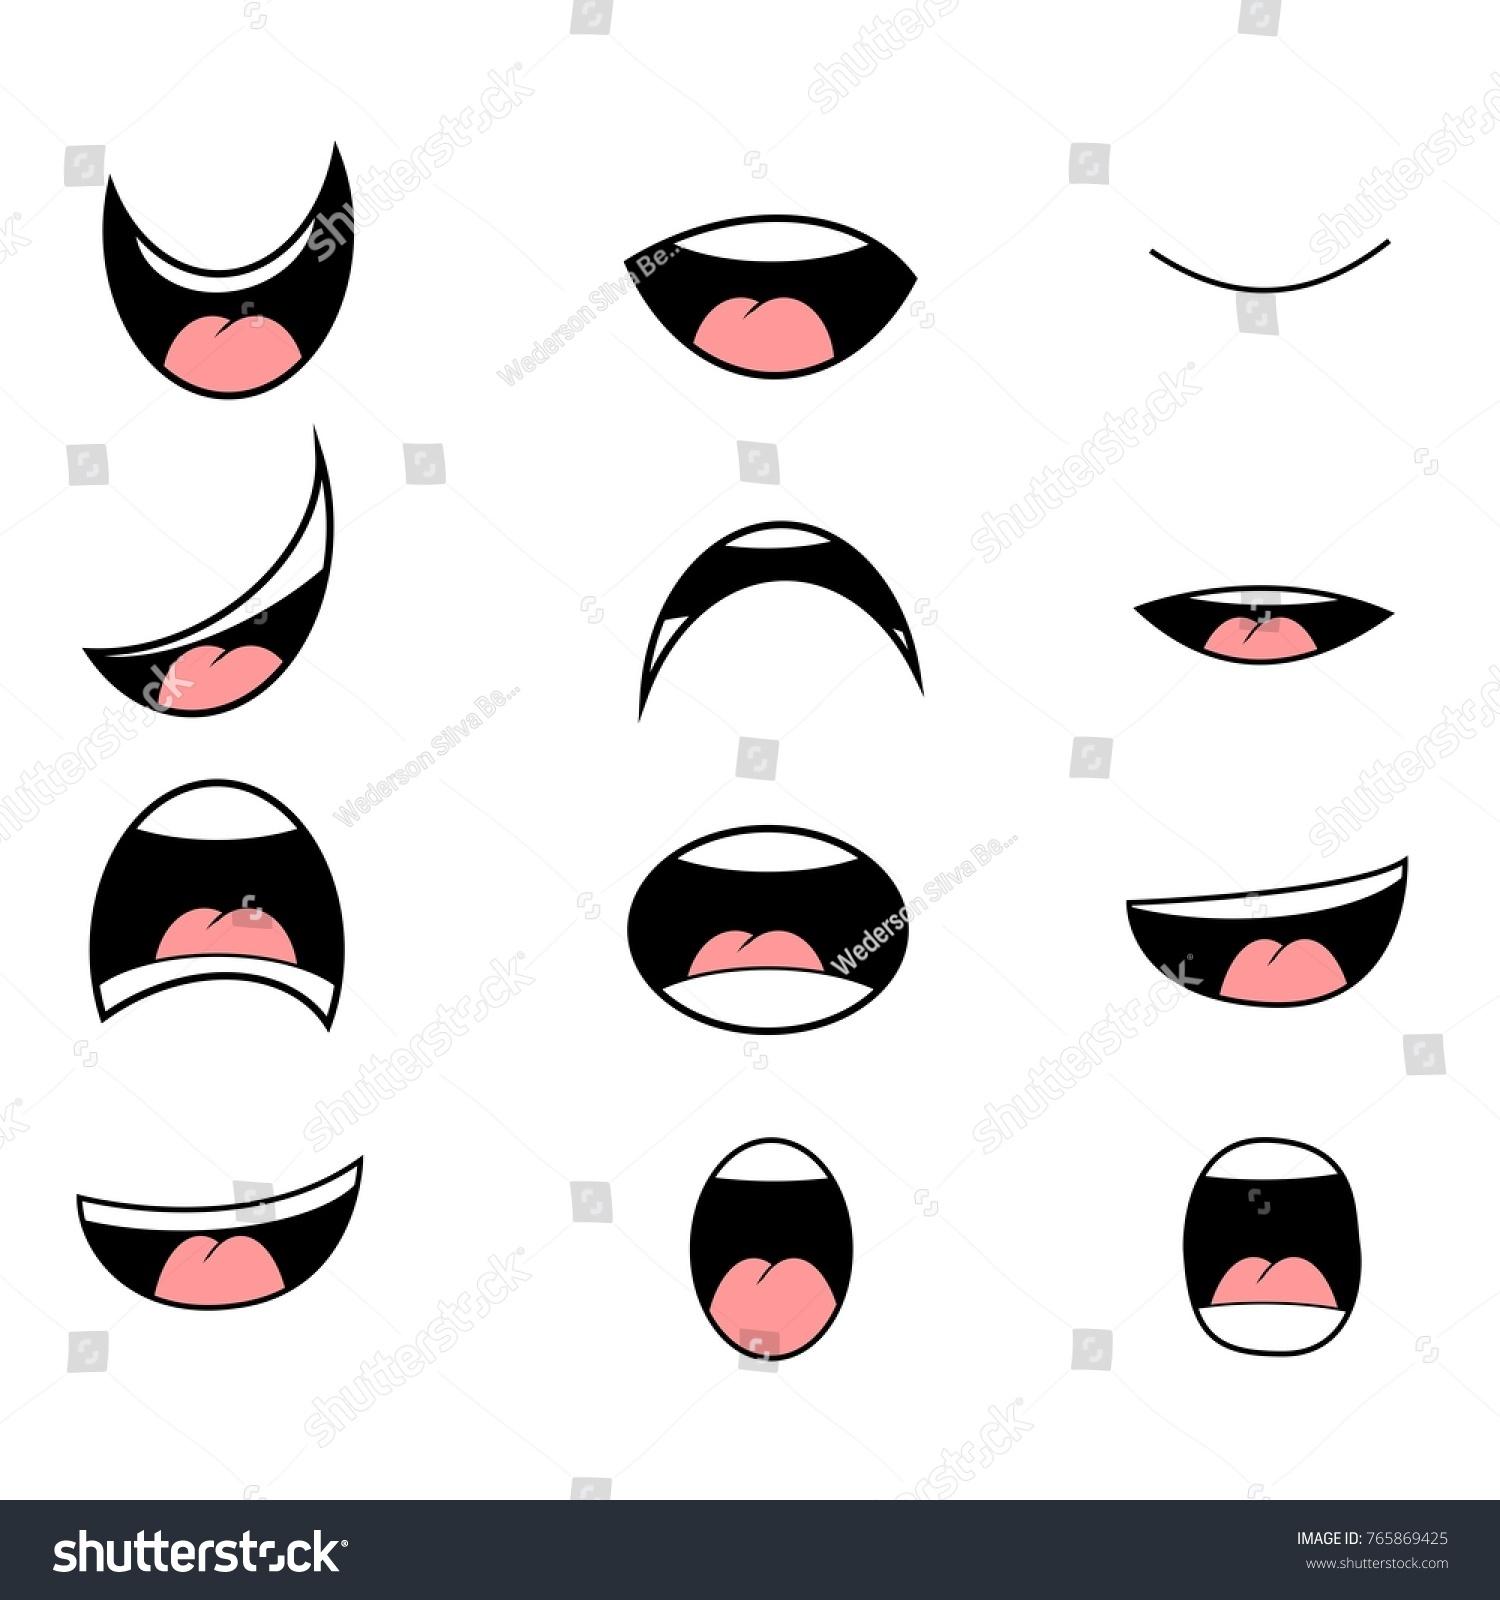 Set Cartoon Mouth Poses Animation Vector Stock-Vektorgrafik ...